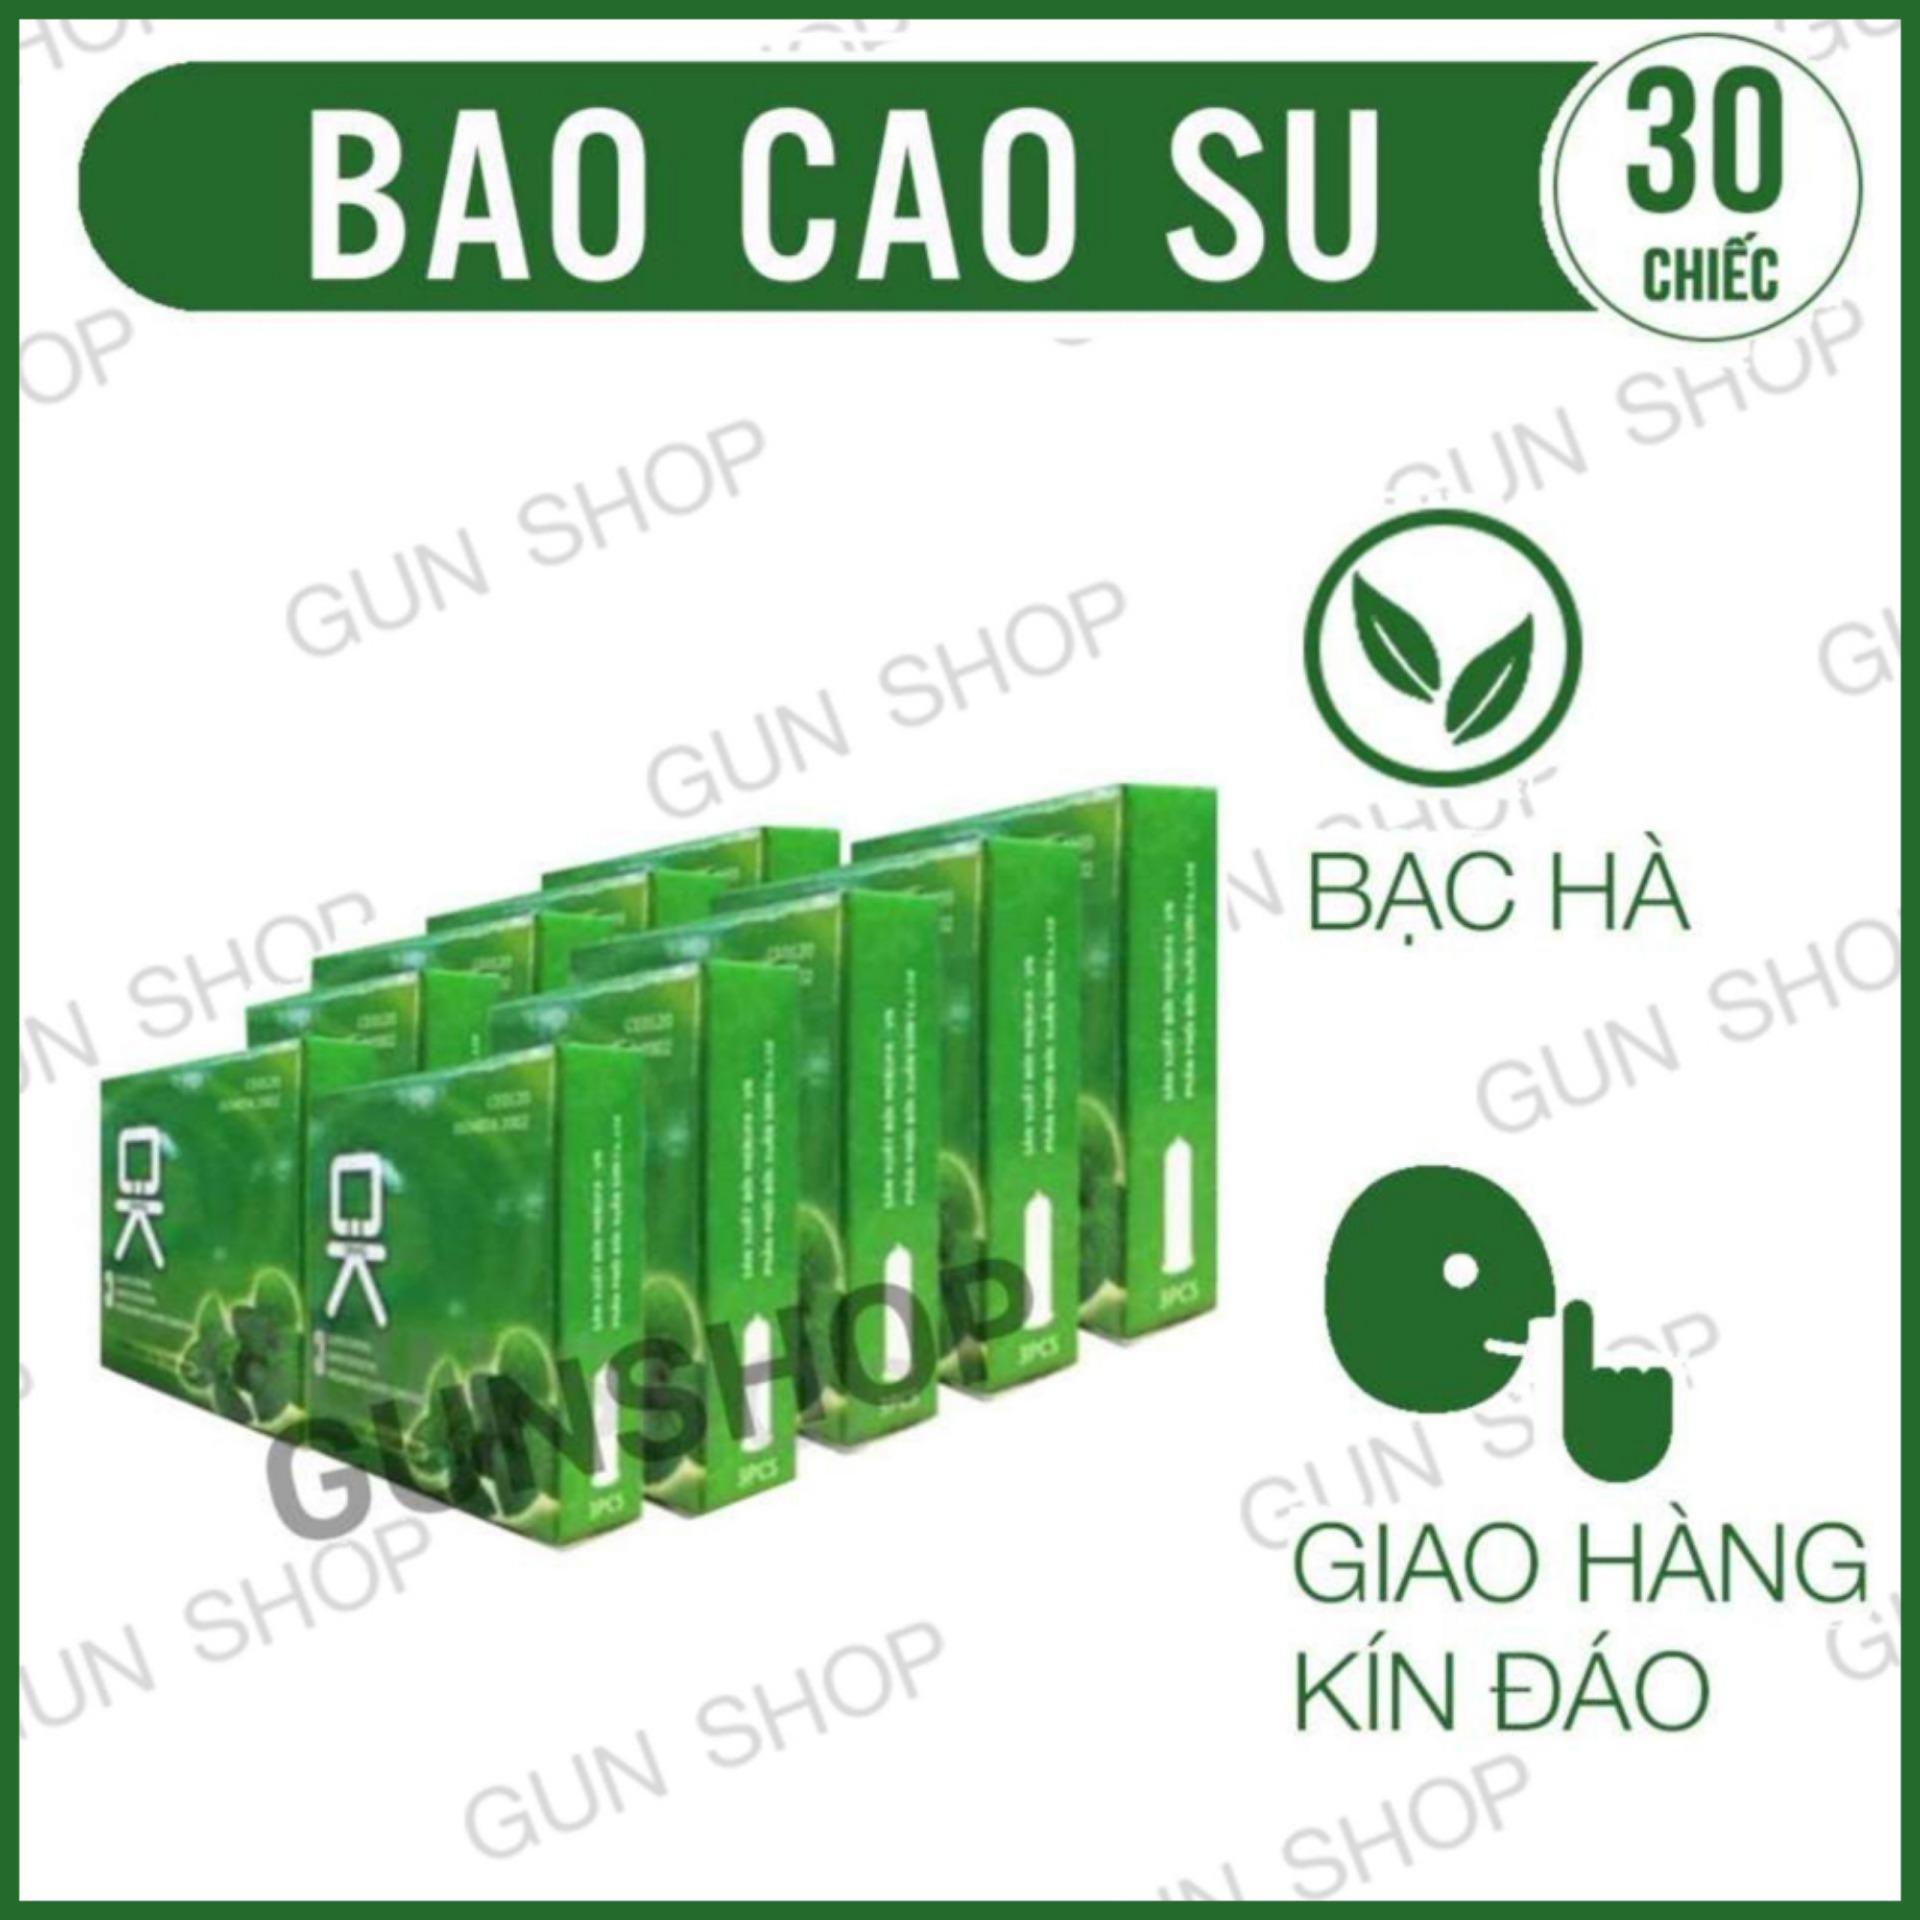 Bộ 10 Hộp Bao Cao Su OK mùi hương bạc hà - [ Gunshop-BCS01 ]